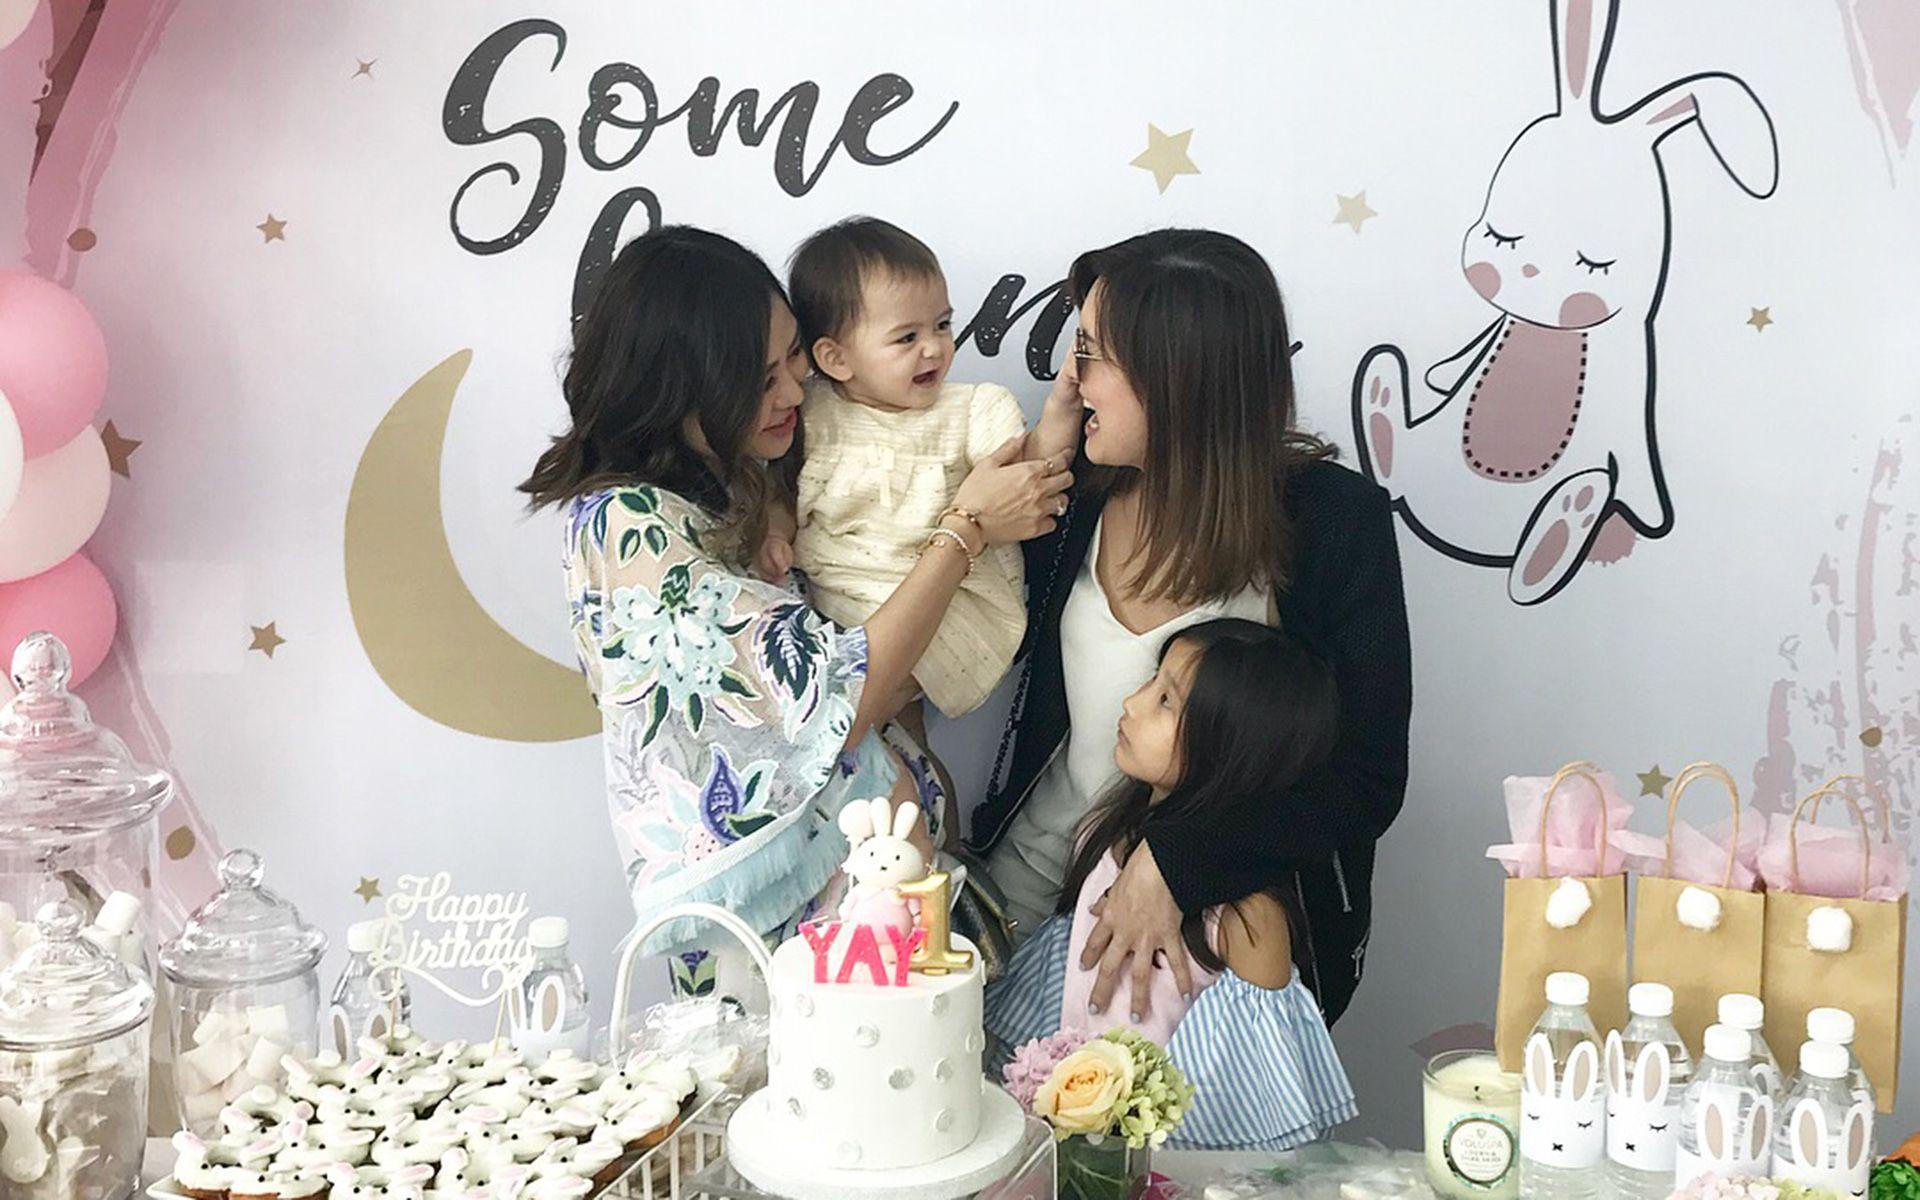 Jenn Low, Olivia Hua Elliott, Danielle Graham and Sophia Khoo